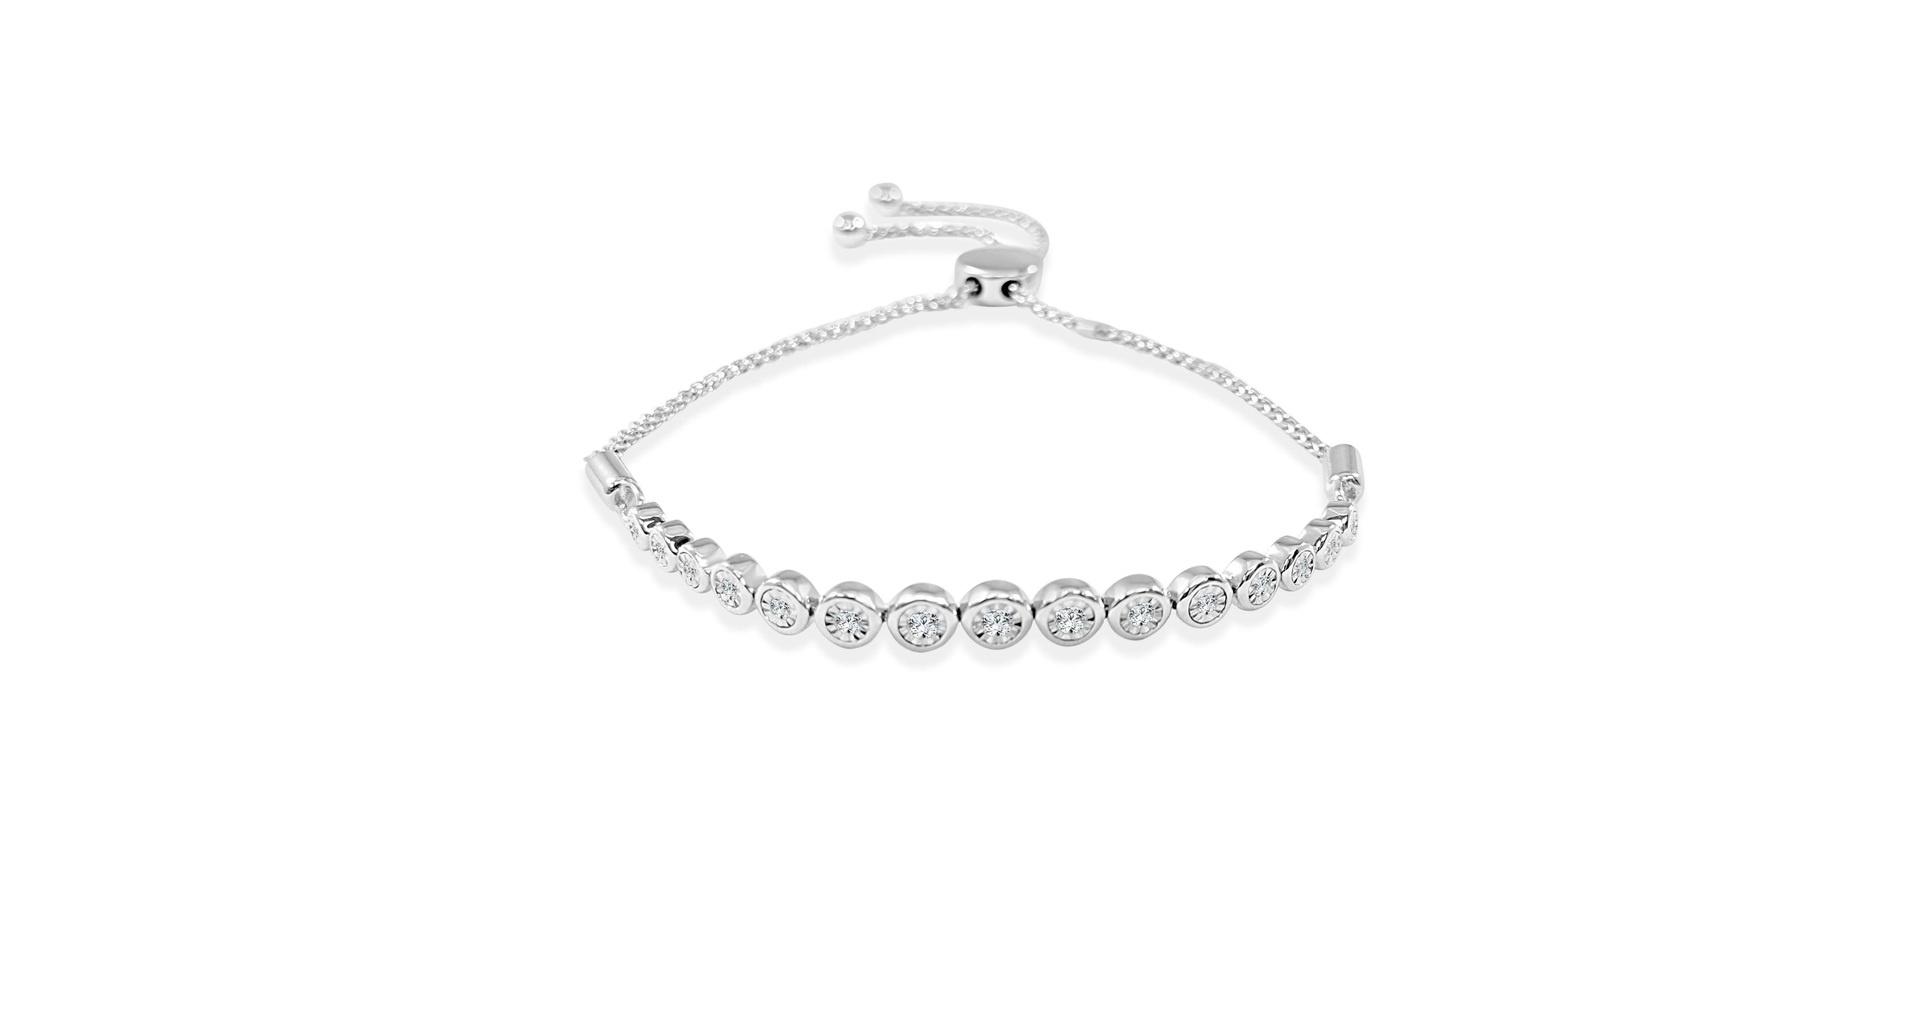 Diamond Bolo Bracelet